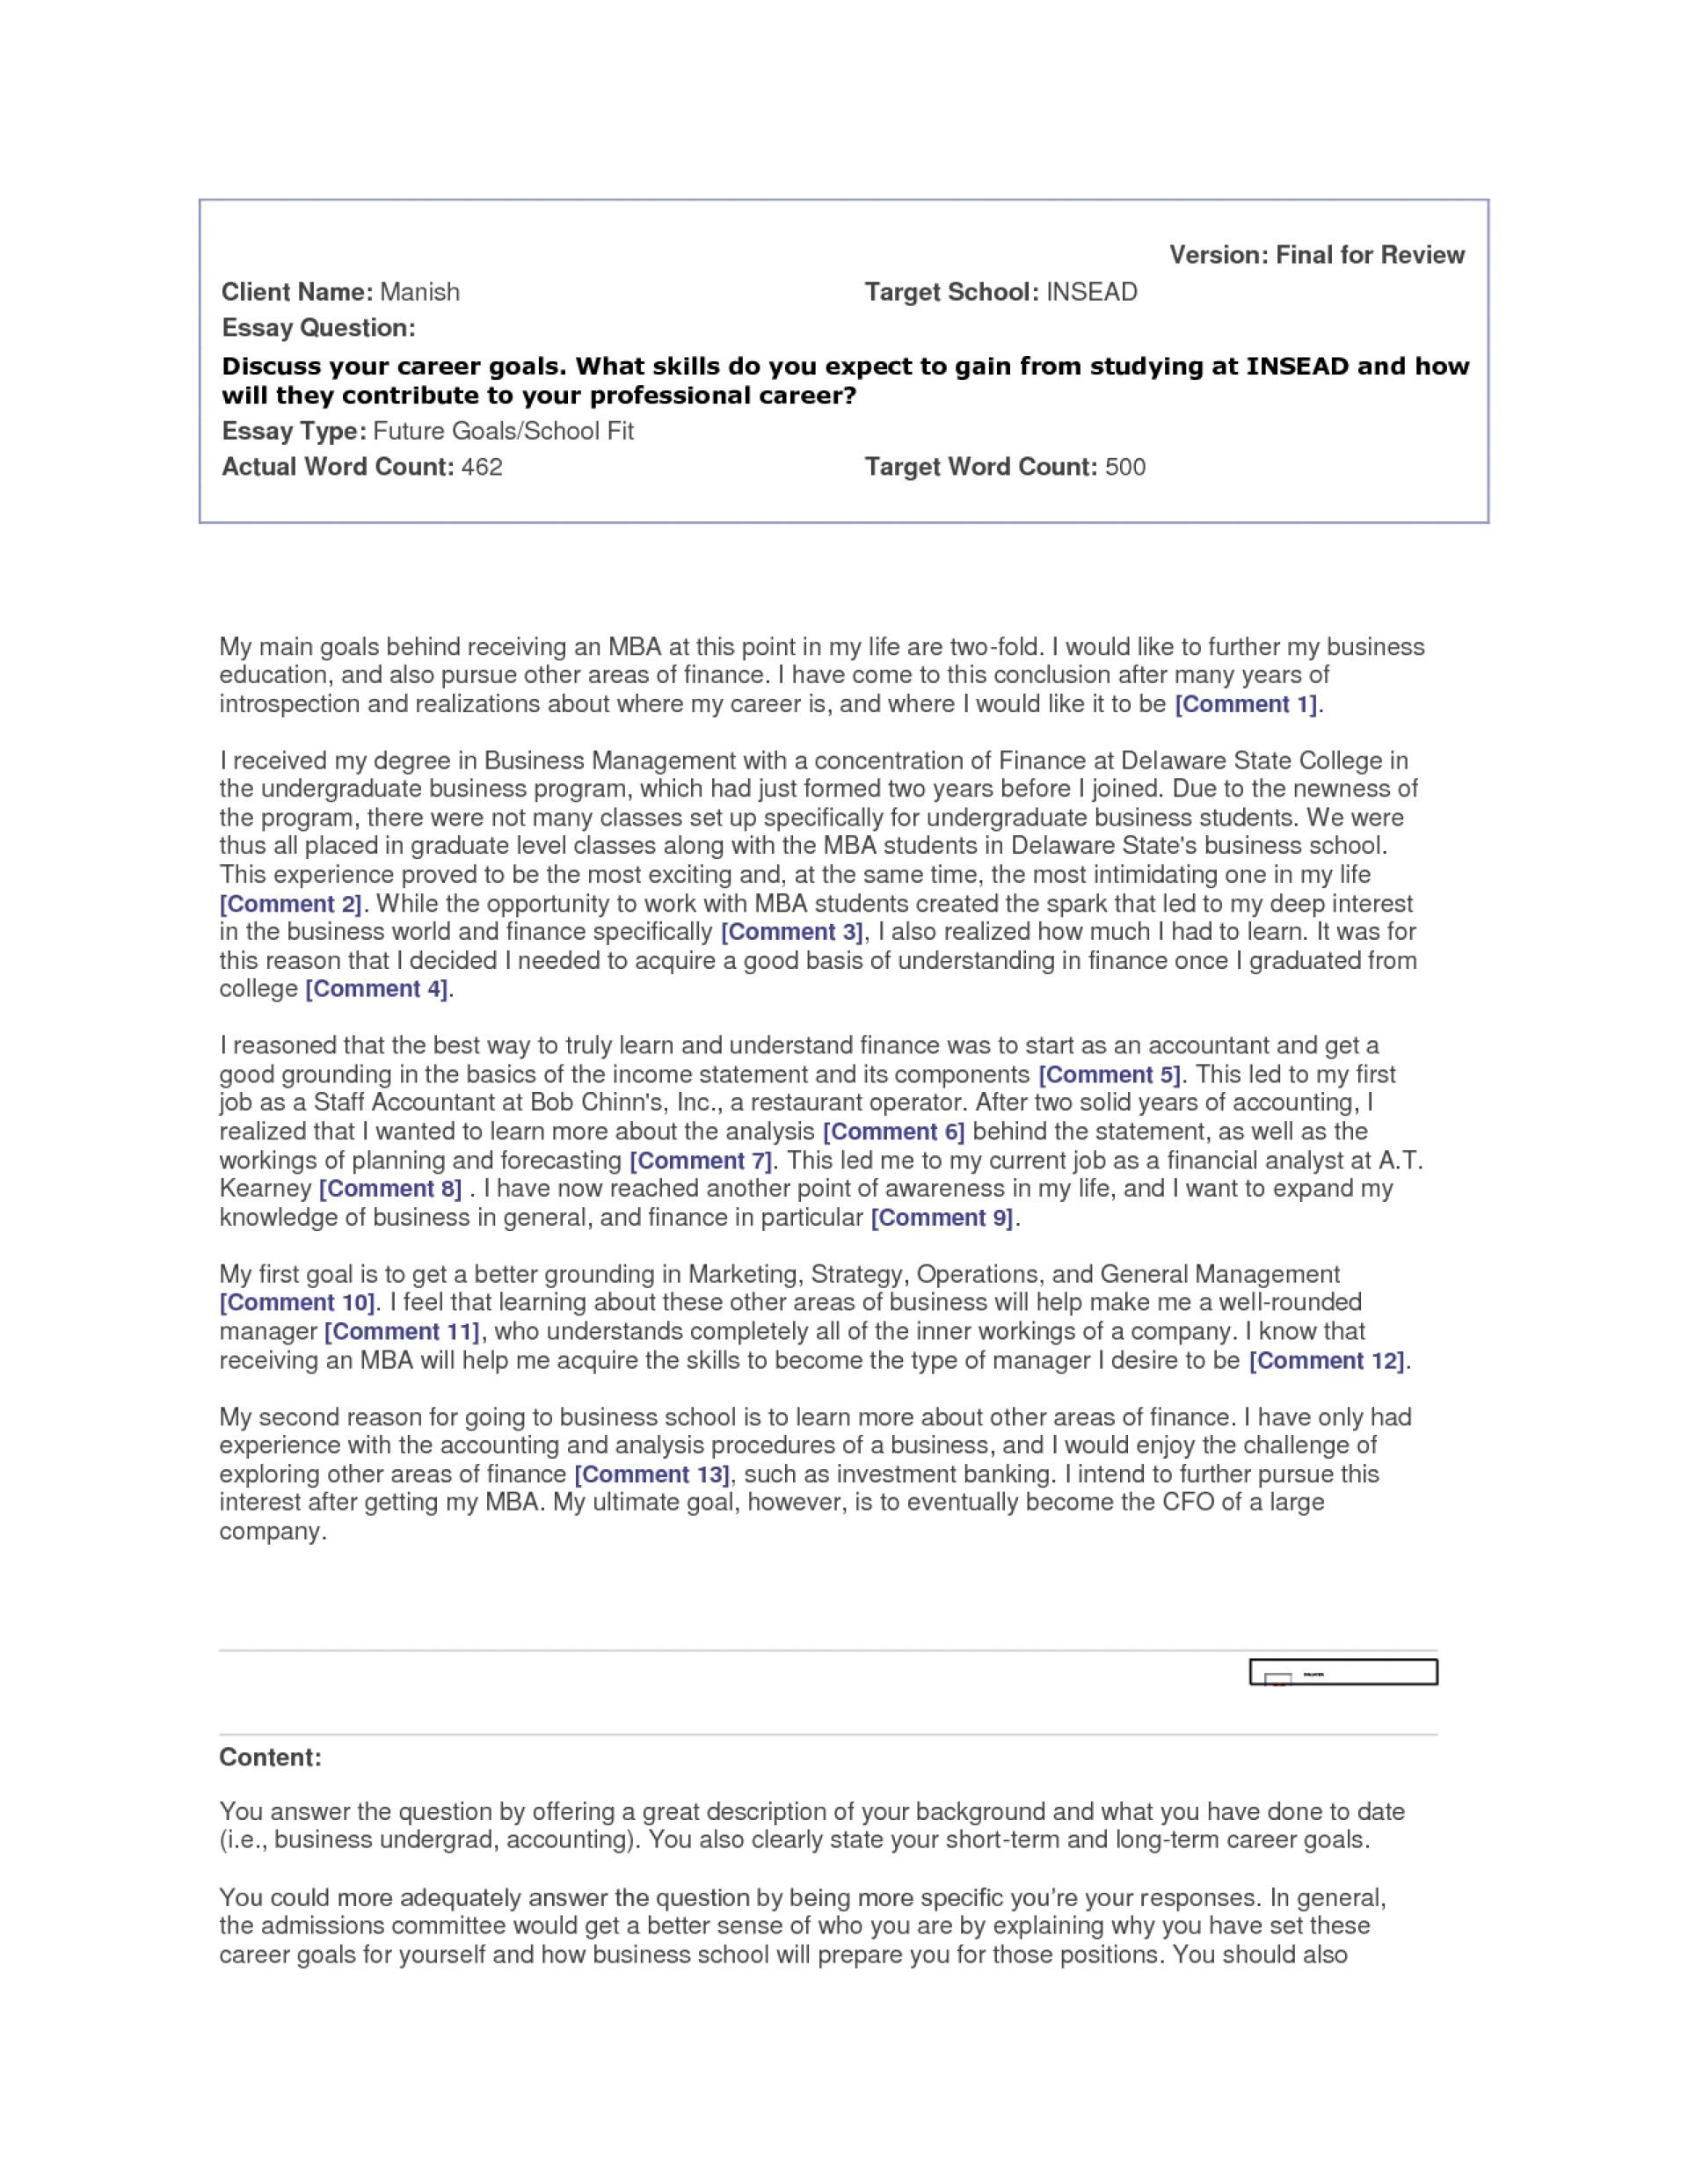 005 Essay Example Career Goals Examples Imposing Scholarship Pdf Educational 1920